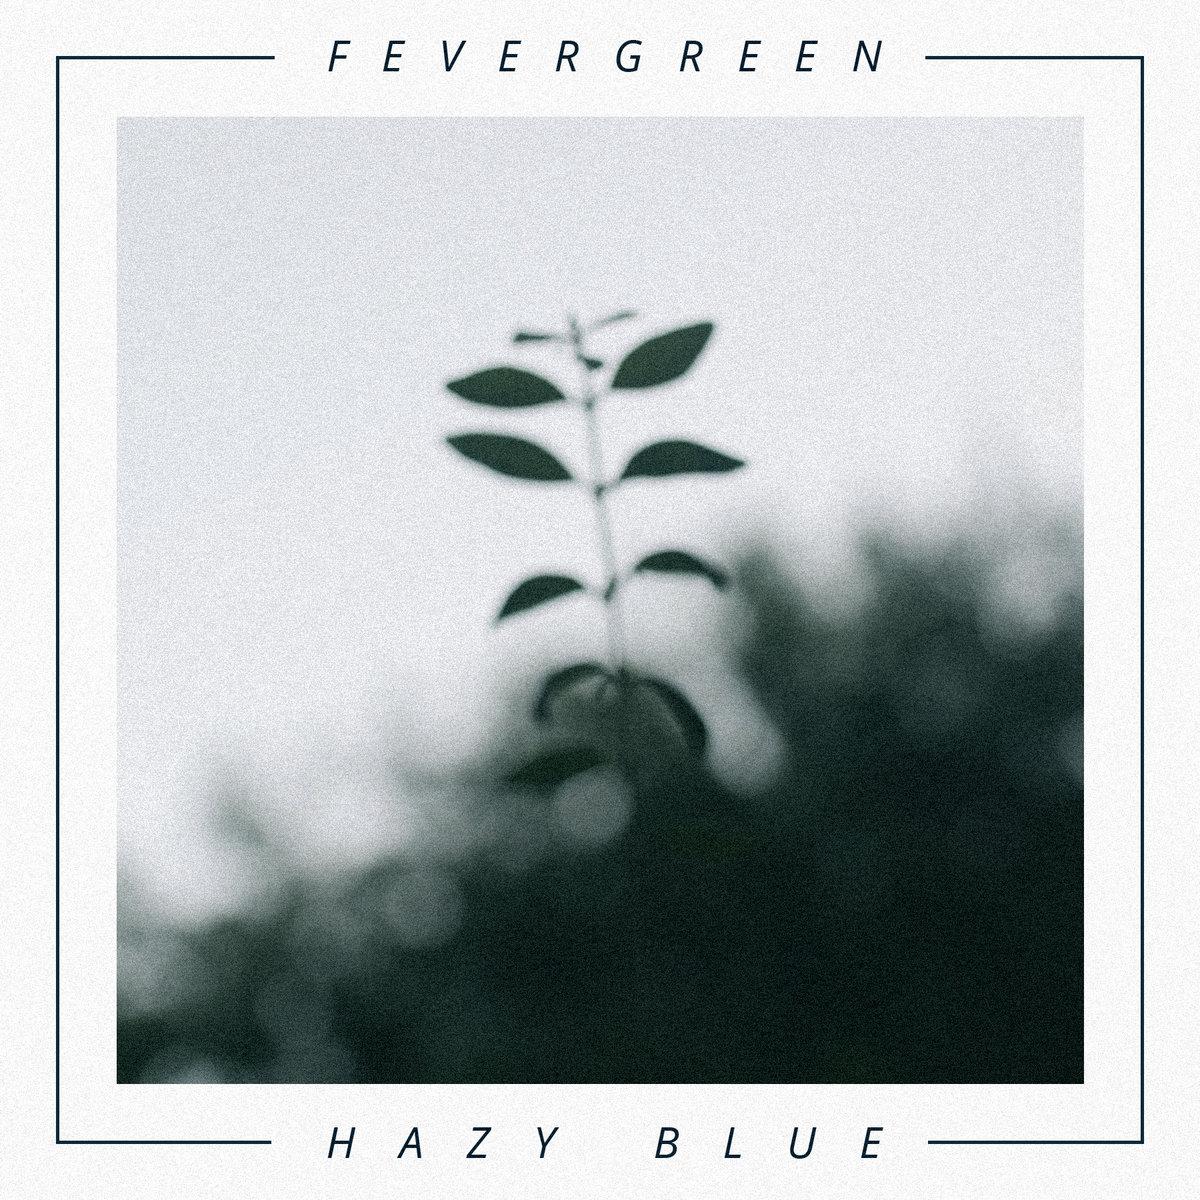 Hazy Blue (single)